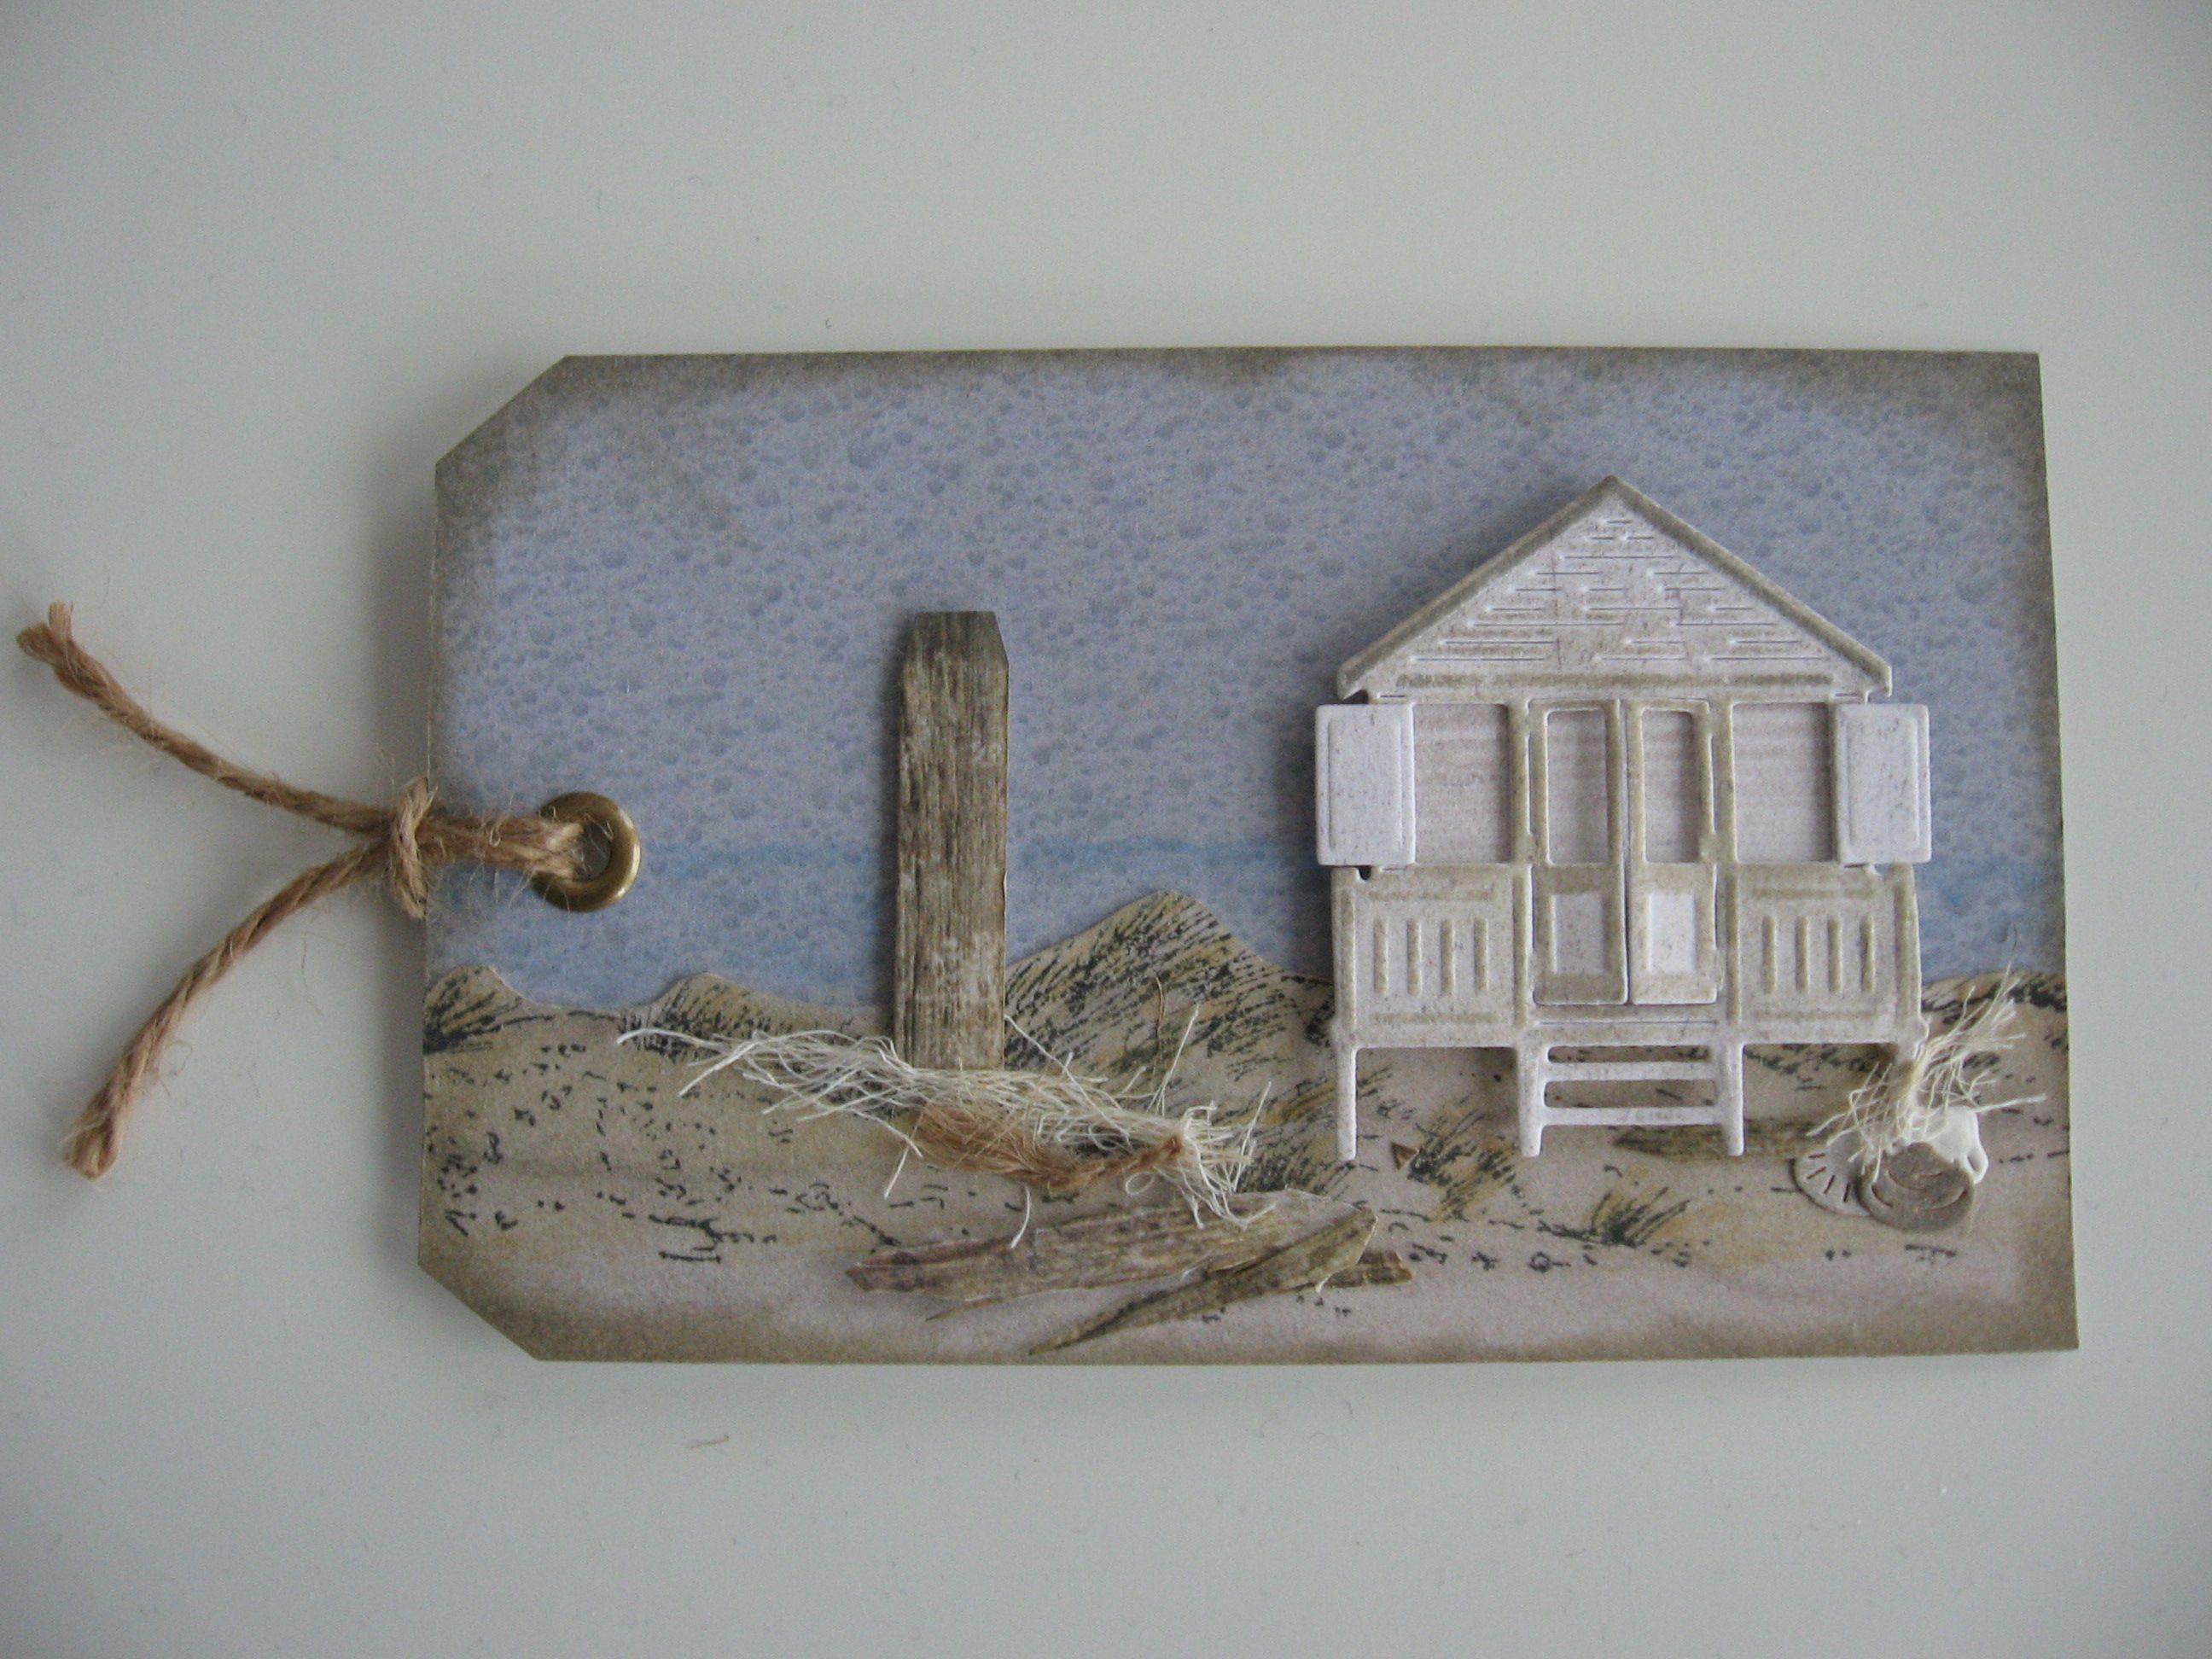 Card tag Beach Sea Seaside Marianne design tiny Beach House sand Water  Label gemaakt Card tag Beach Sea Seaside Marianne design tiny Beach House sand  . Home Design Card. Home Design Ideas